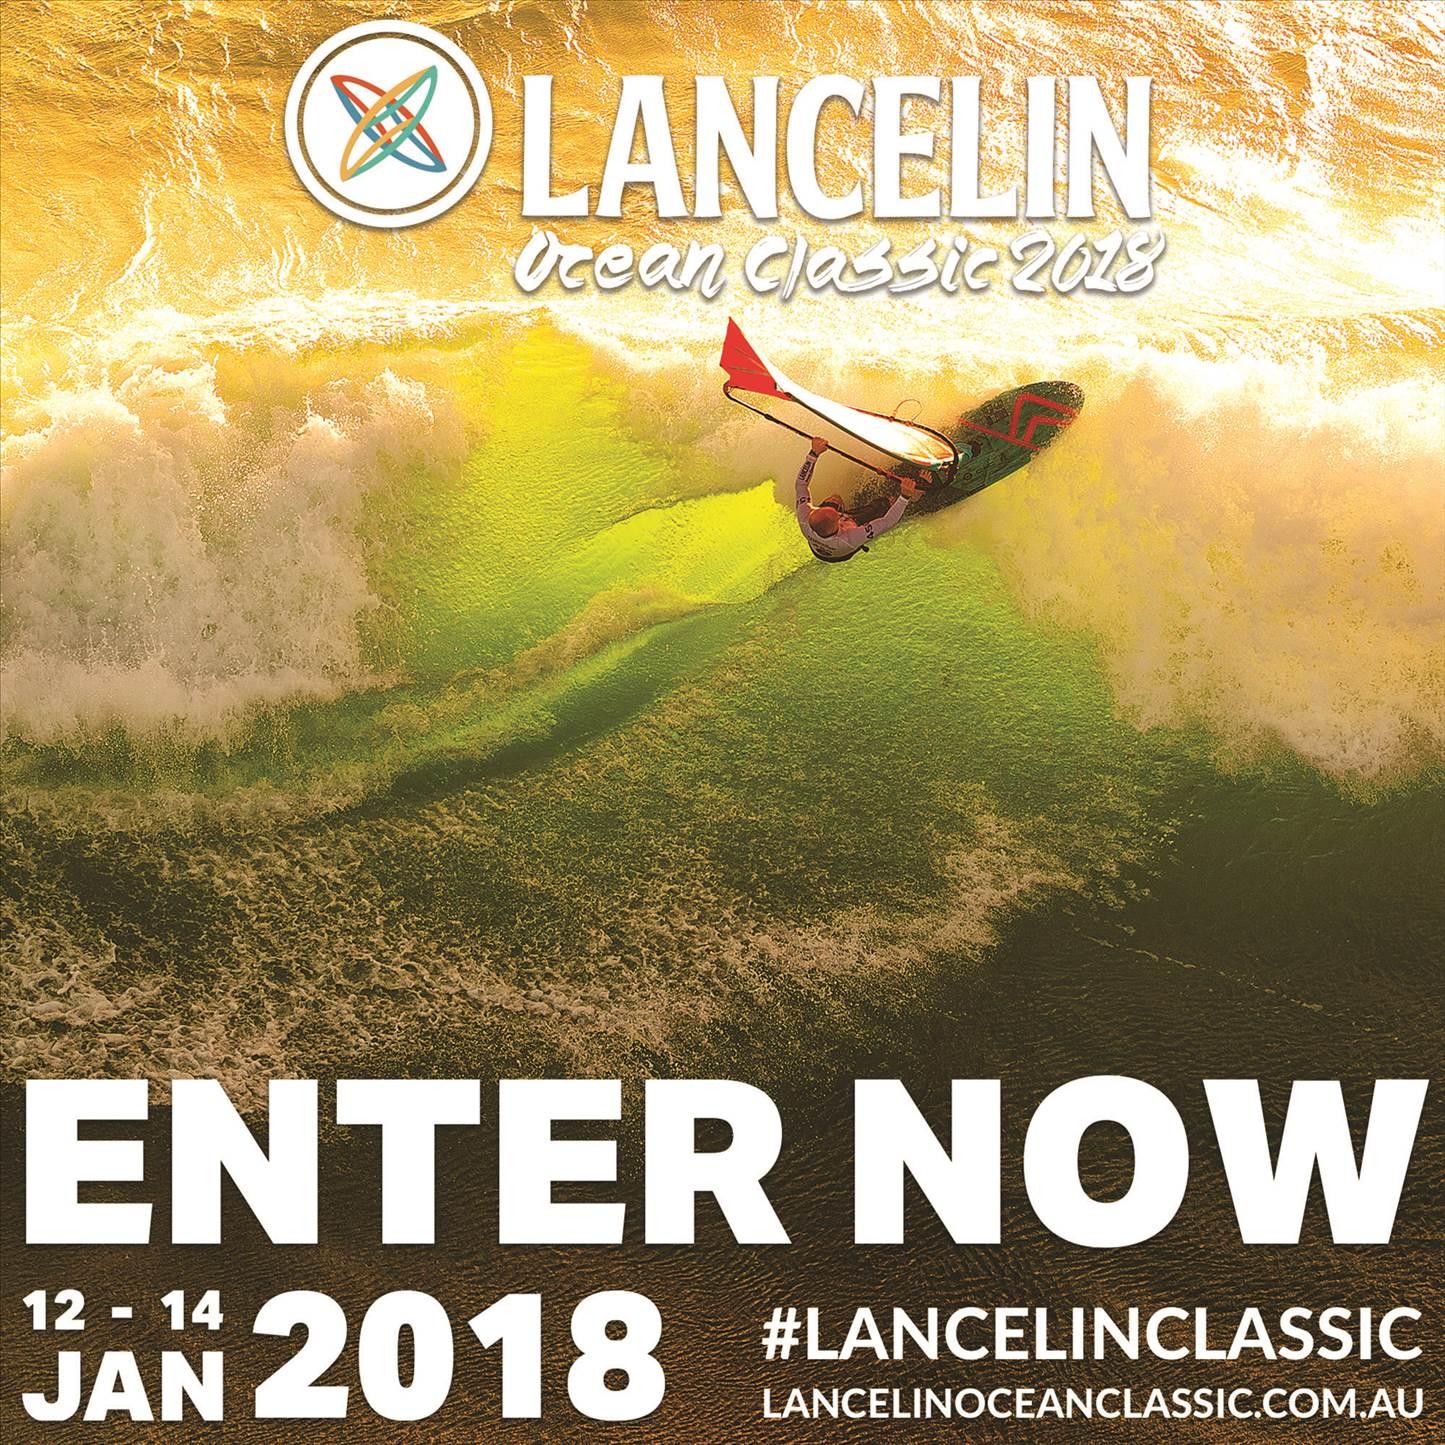 Lancelin Ocean Classic 2018 Entries Open!!!!!!!! | Kitesurfing